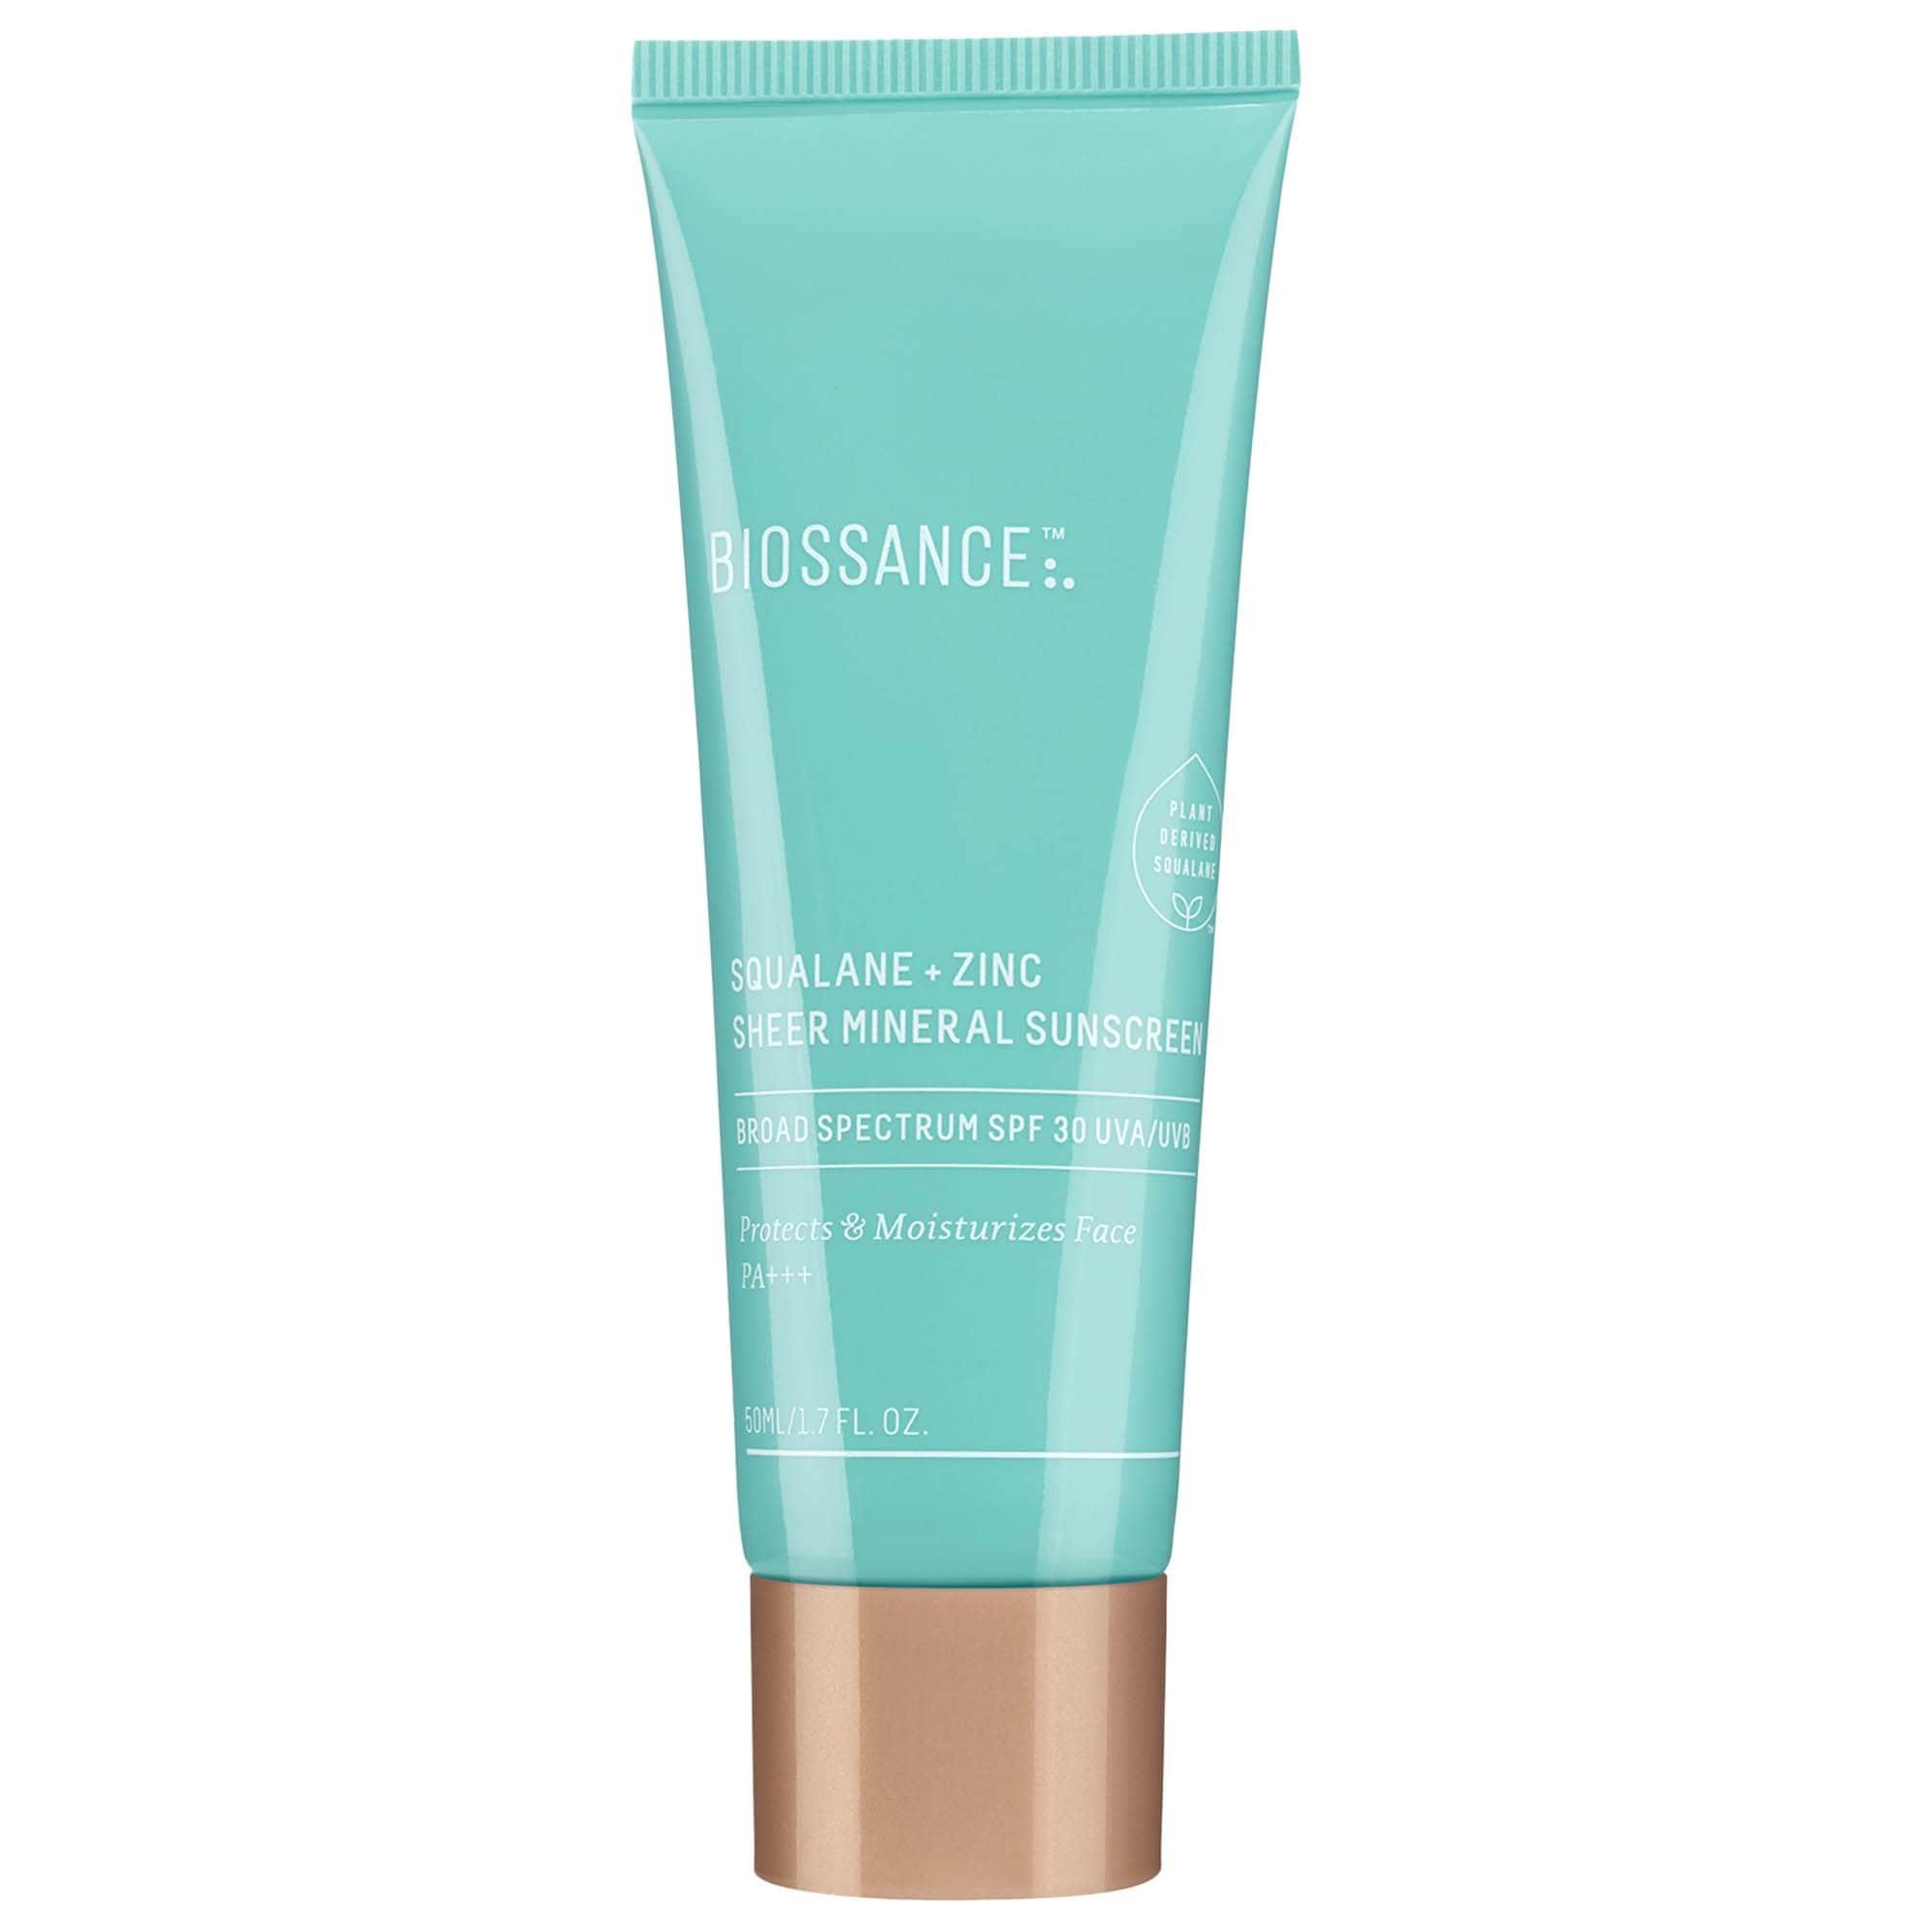 Biossance - Squalane + Zinc Sheer Mineral Sunscreen SPF 30 PA +++